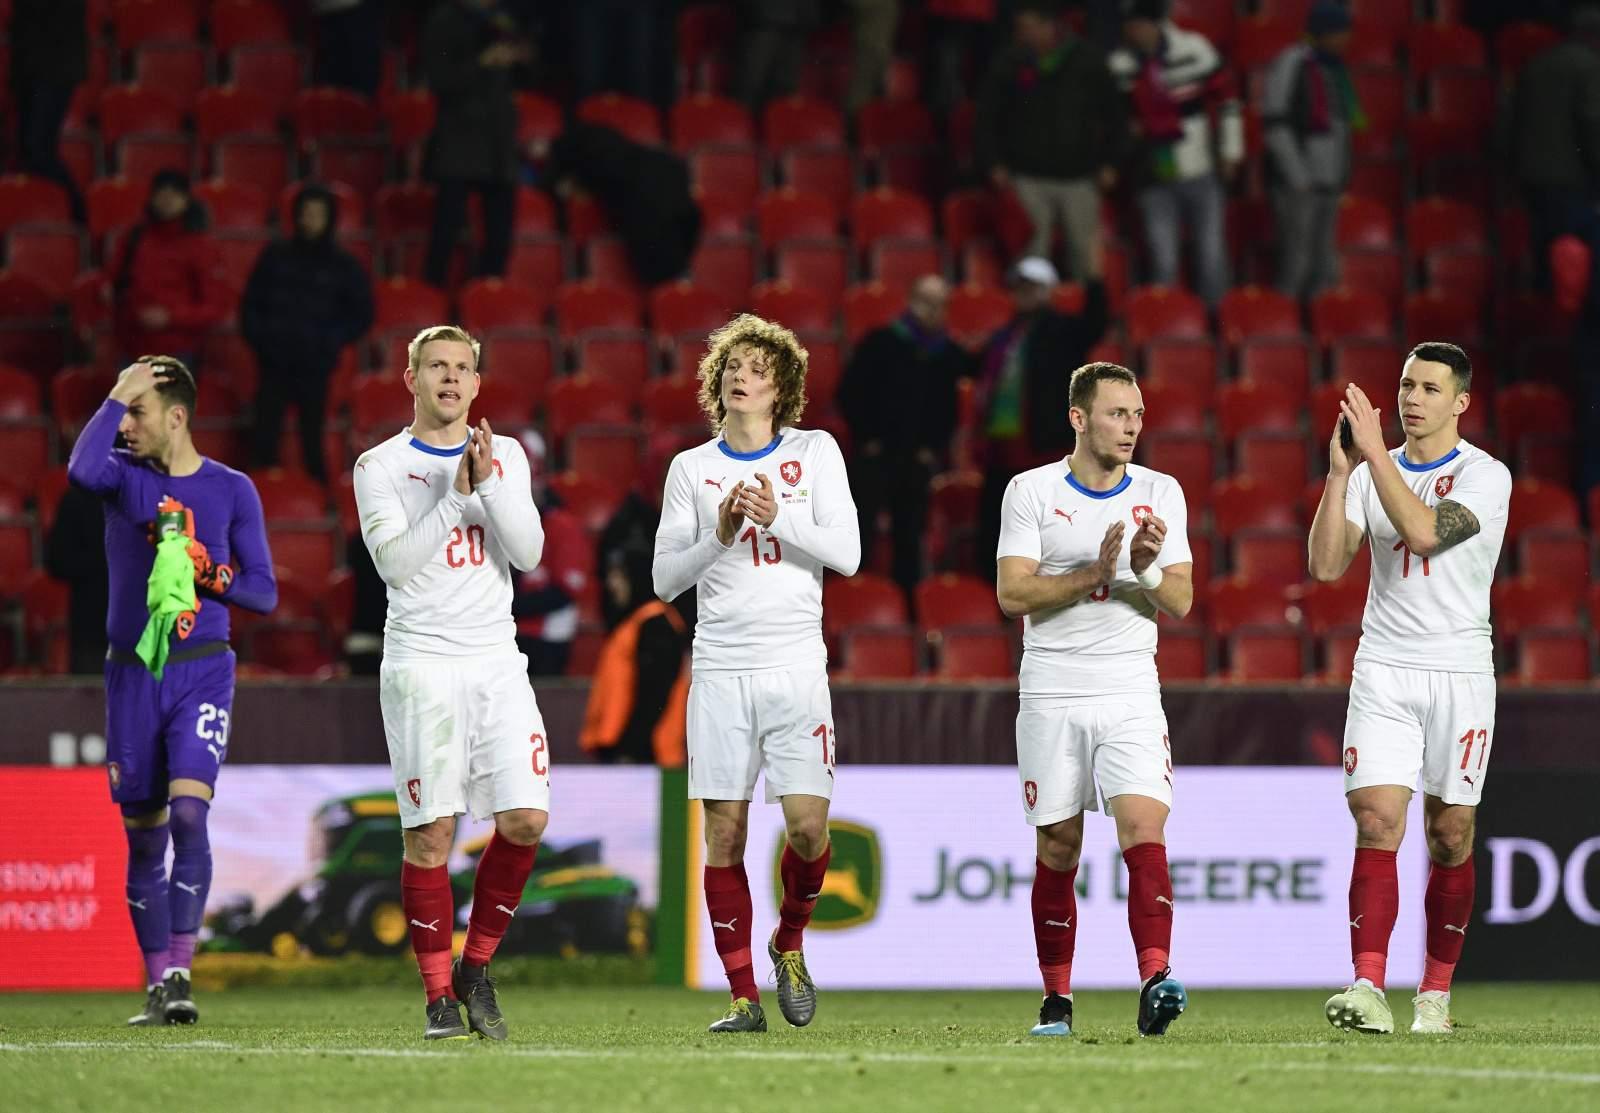 Чехия – Беларусь: прогноз на матч отборочного цикла чемпионата мира-2022 - 2 сентября 2021